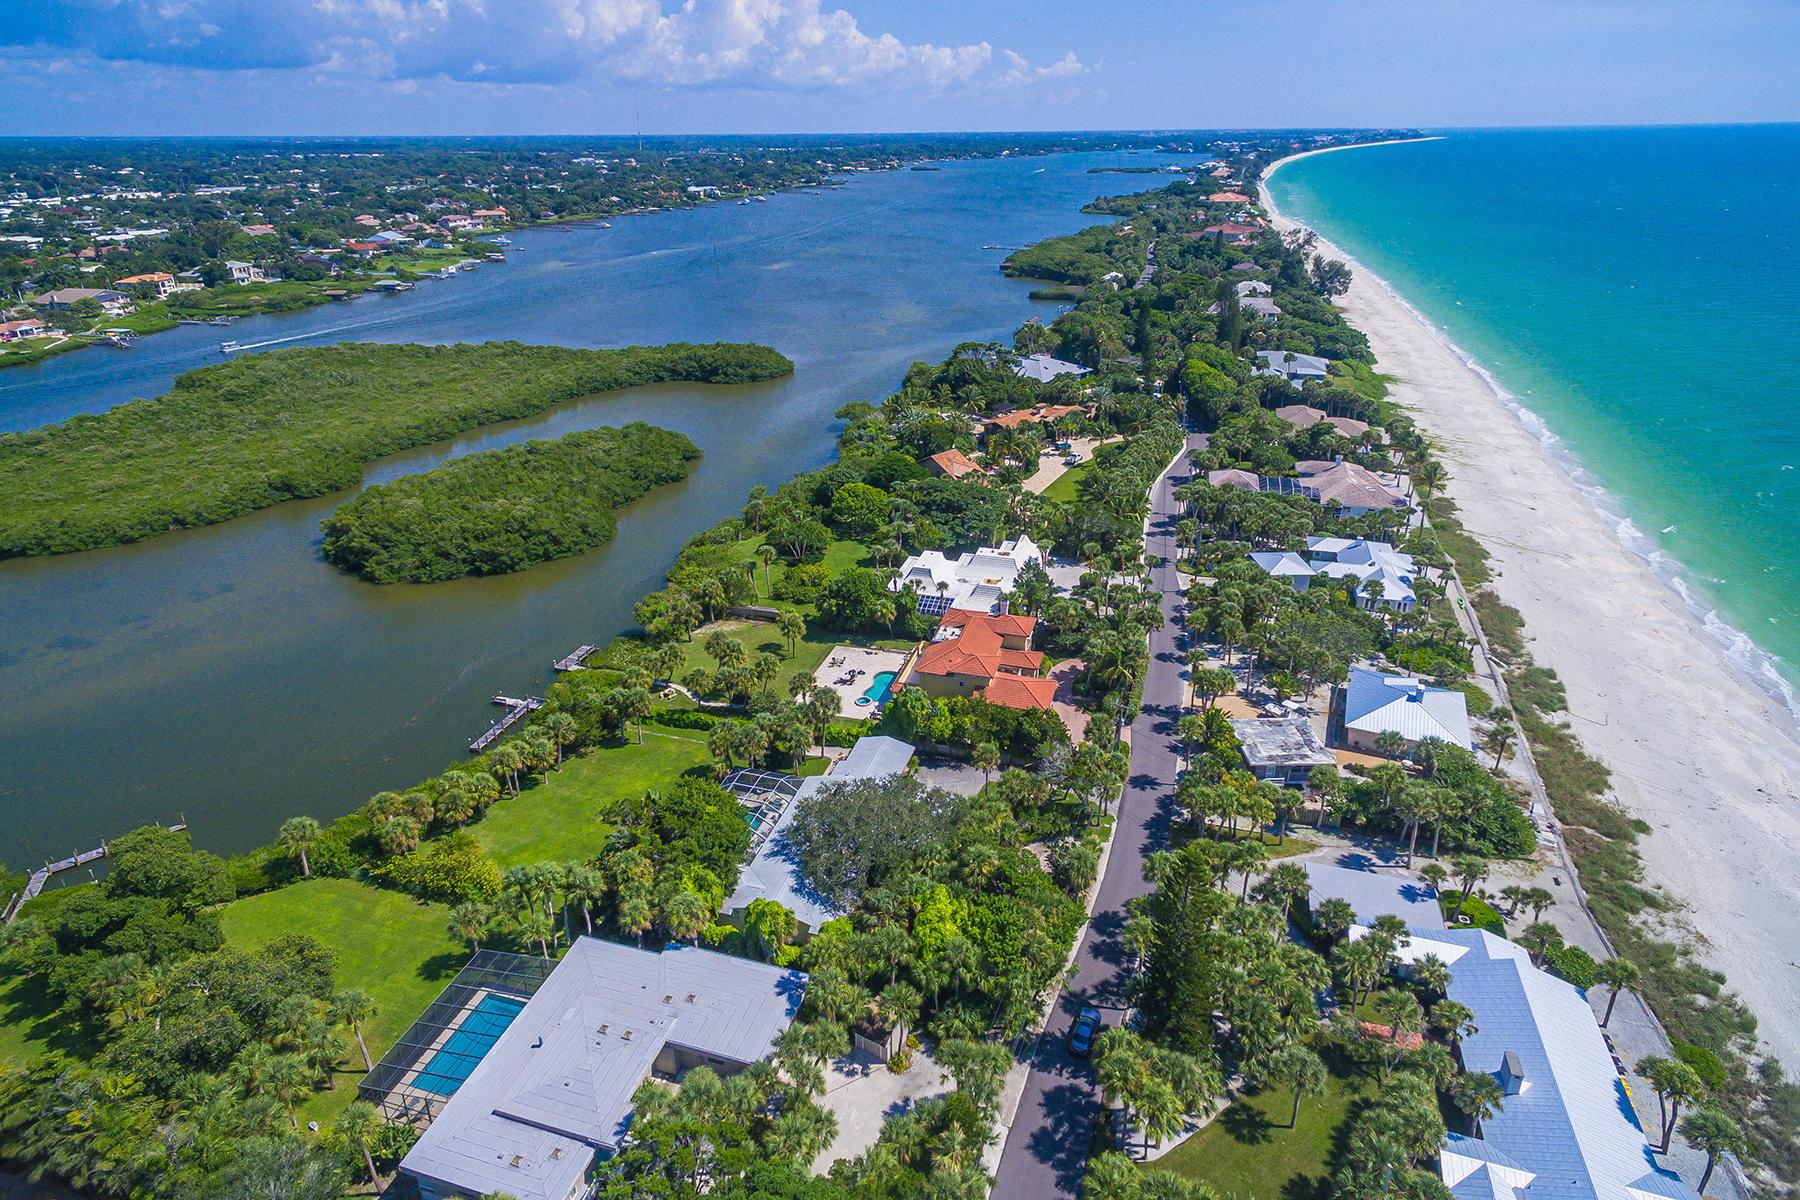 Single Family Homes for Sale at 2816 Casey Key Rd, Nokomis, Florida 34275 United States